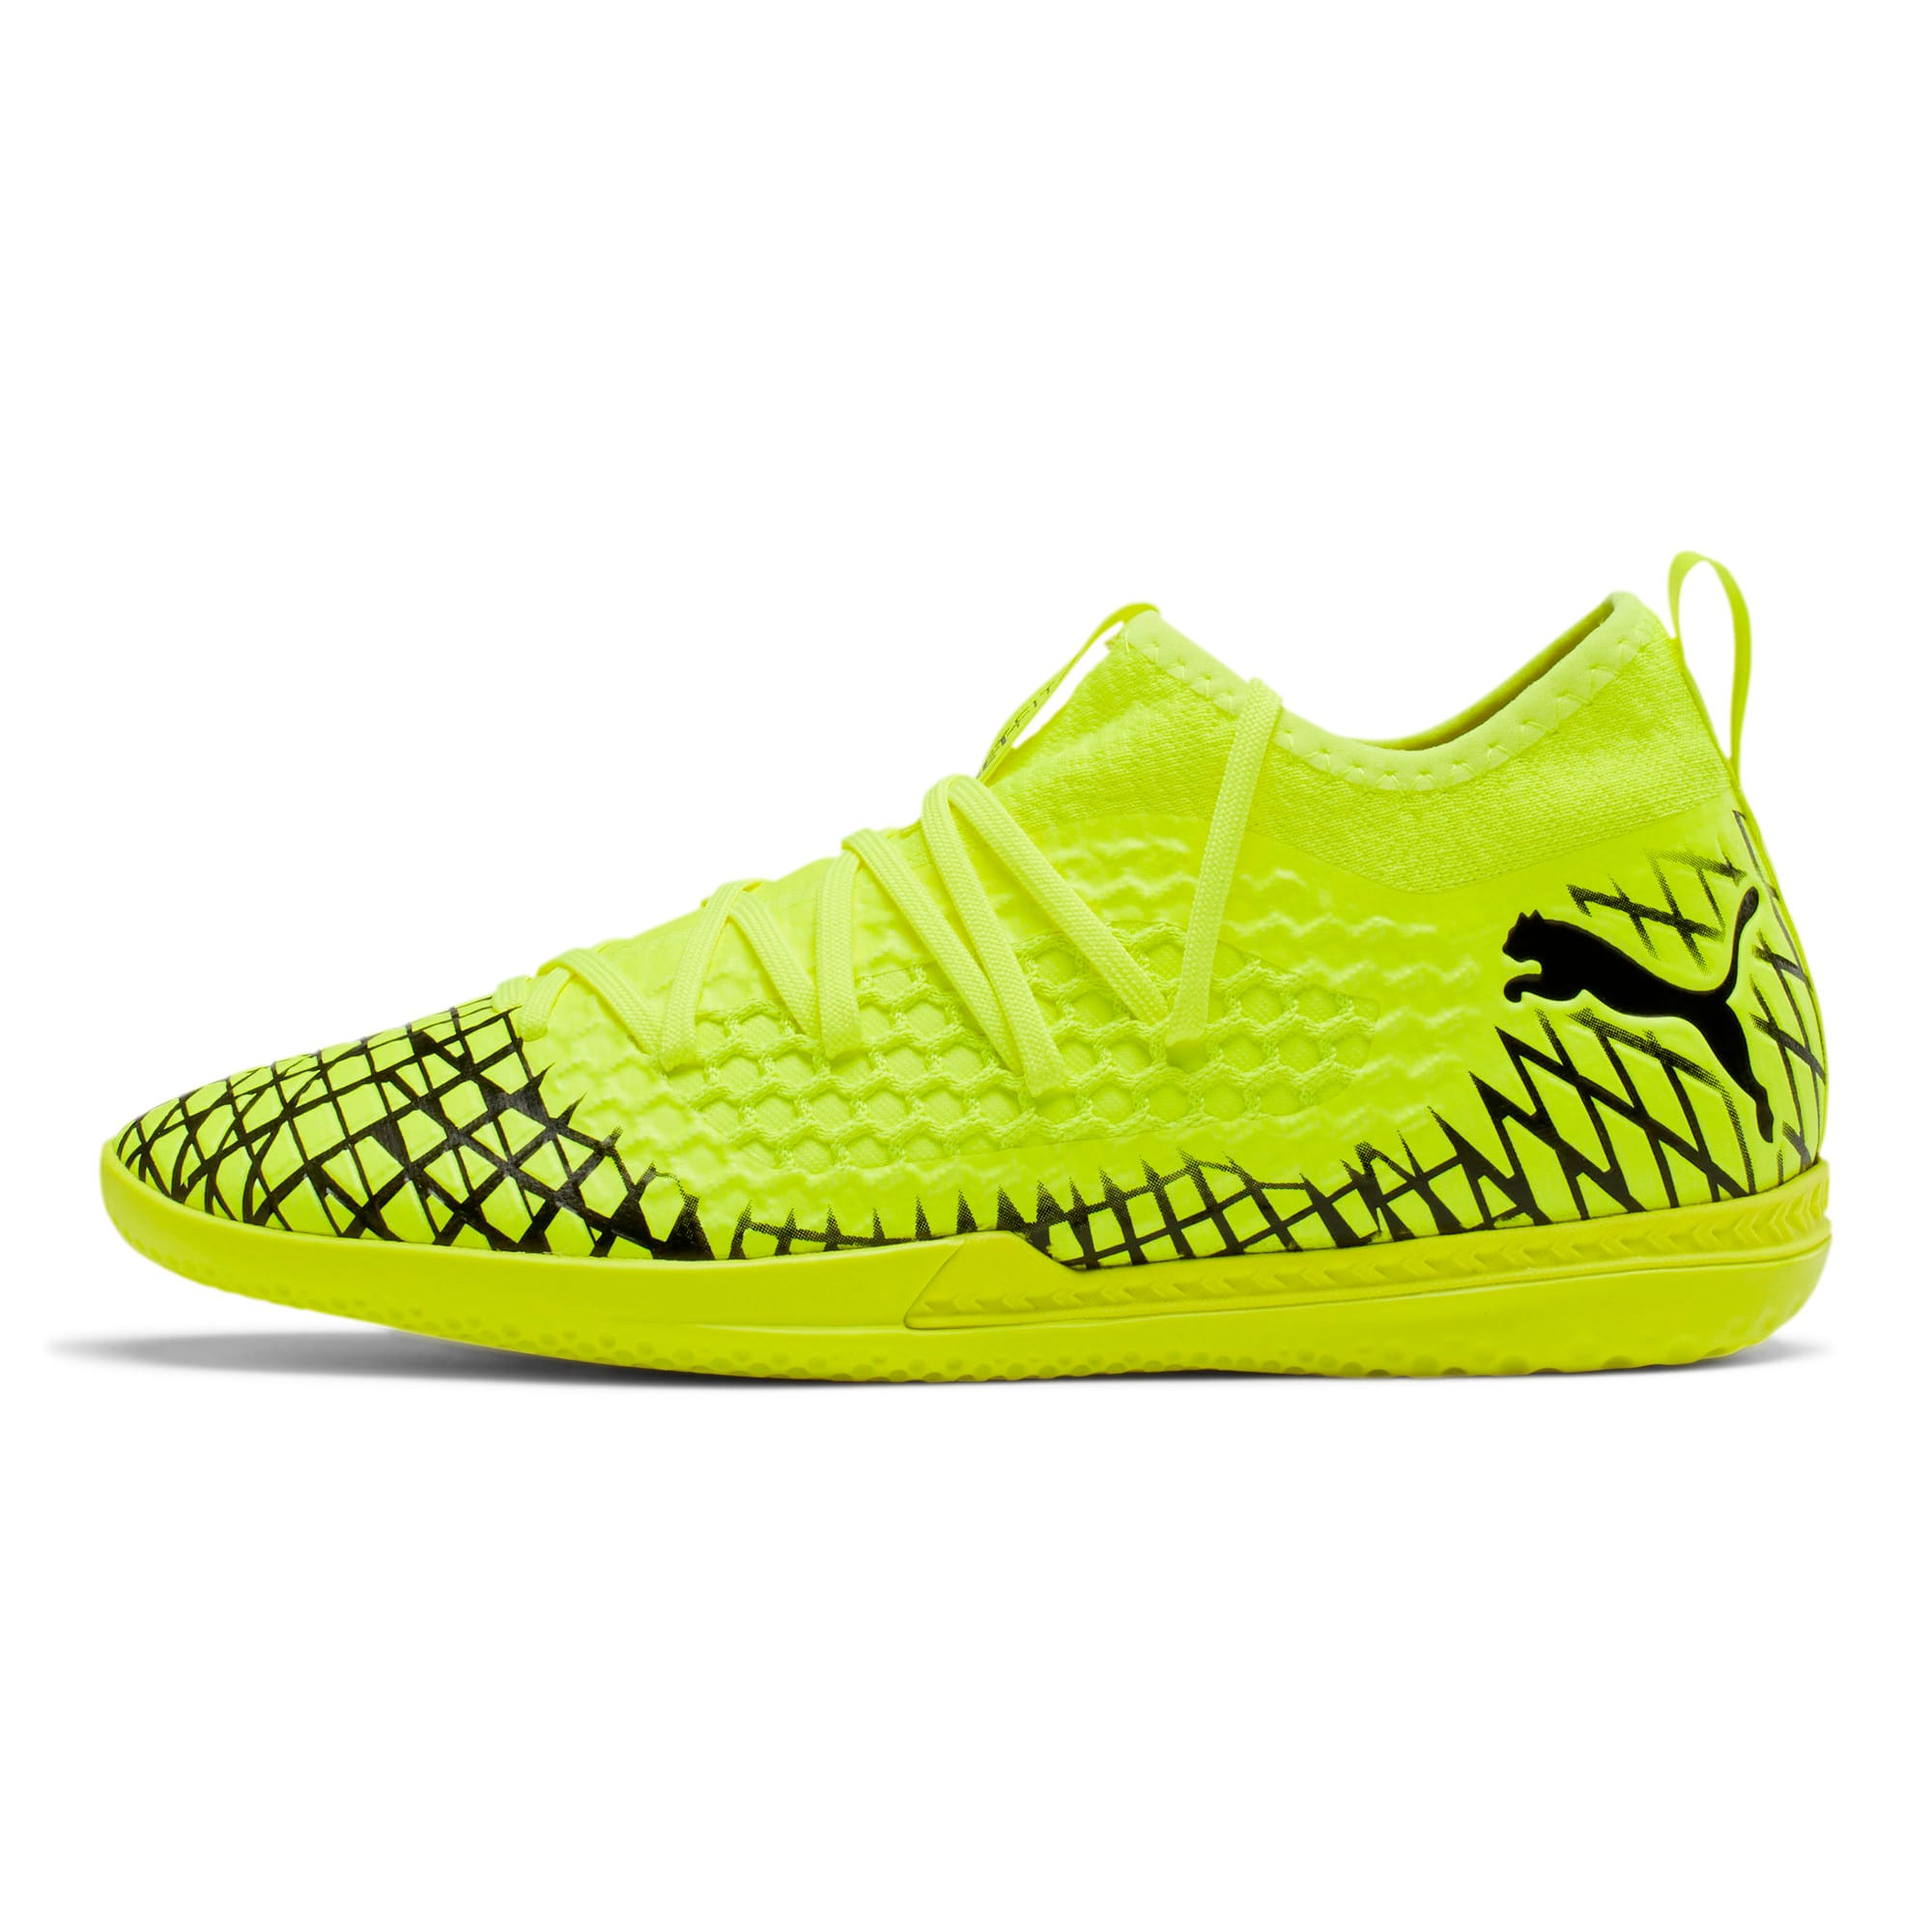 Thumbnail 1 of FUTURE 4.3 NETFIT IT Men's Soccer Shoes, Yellow Alert-Puma Black, medium